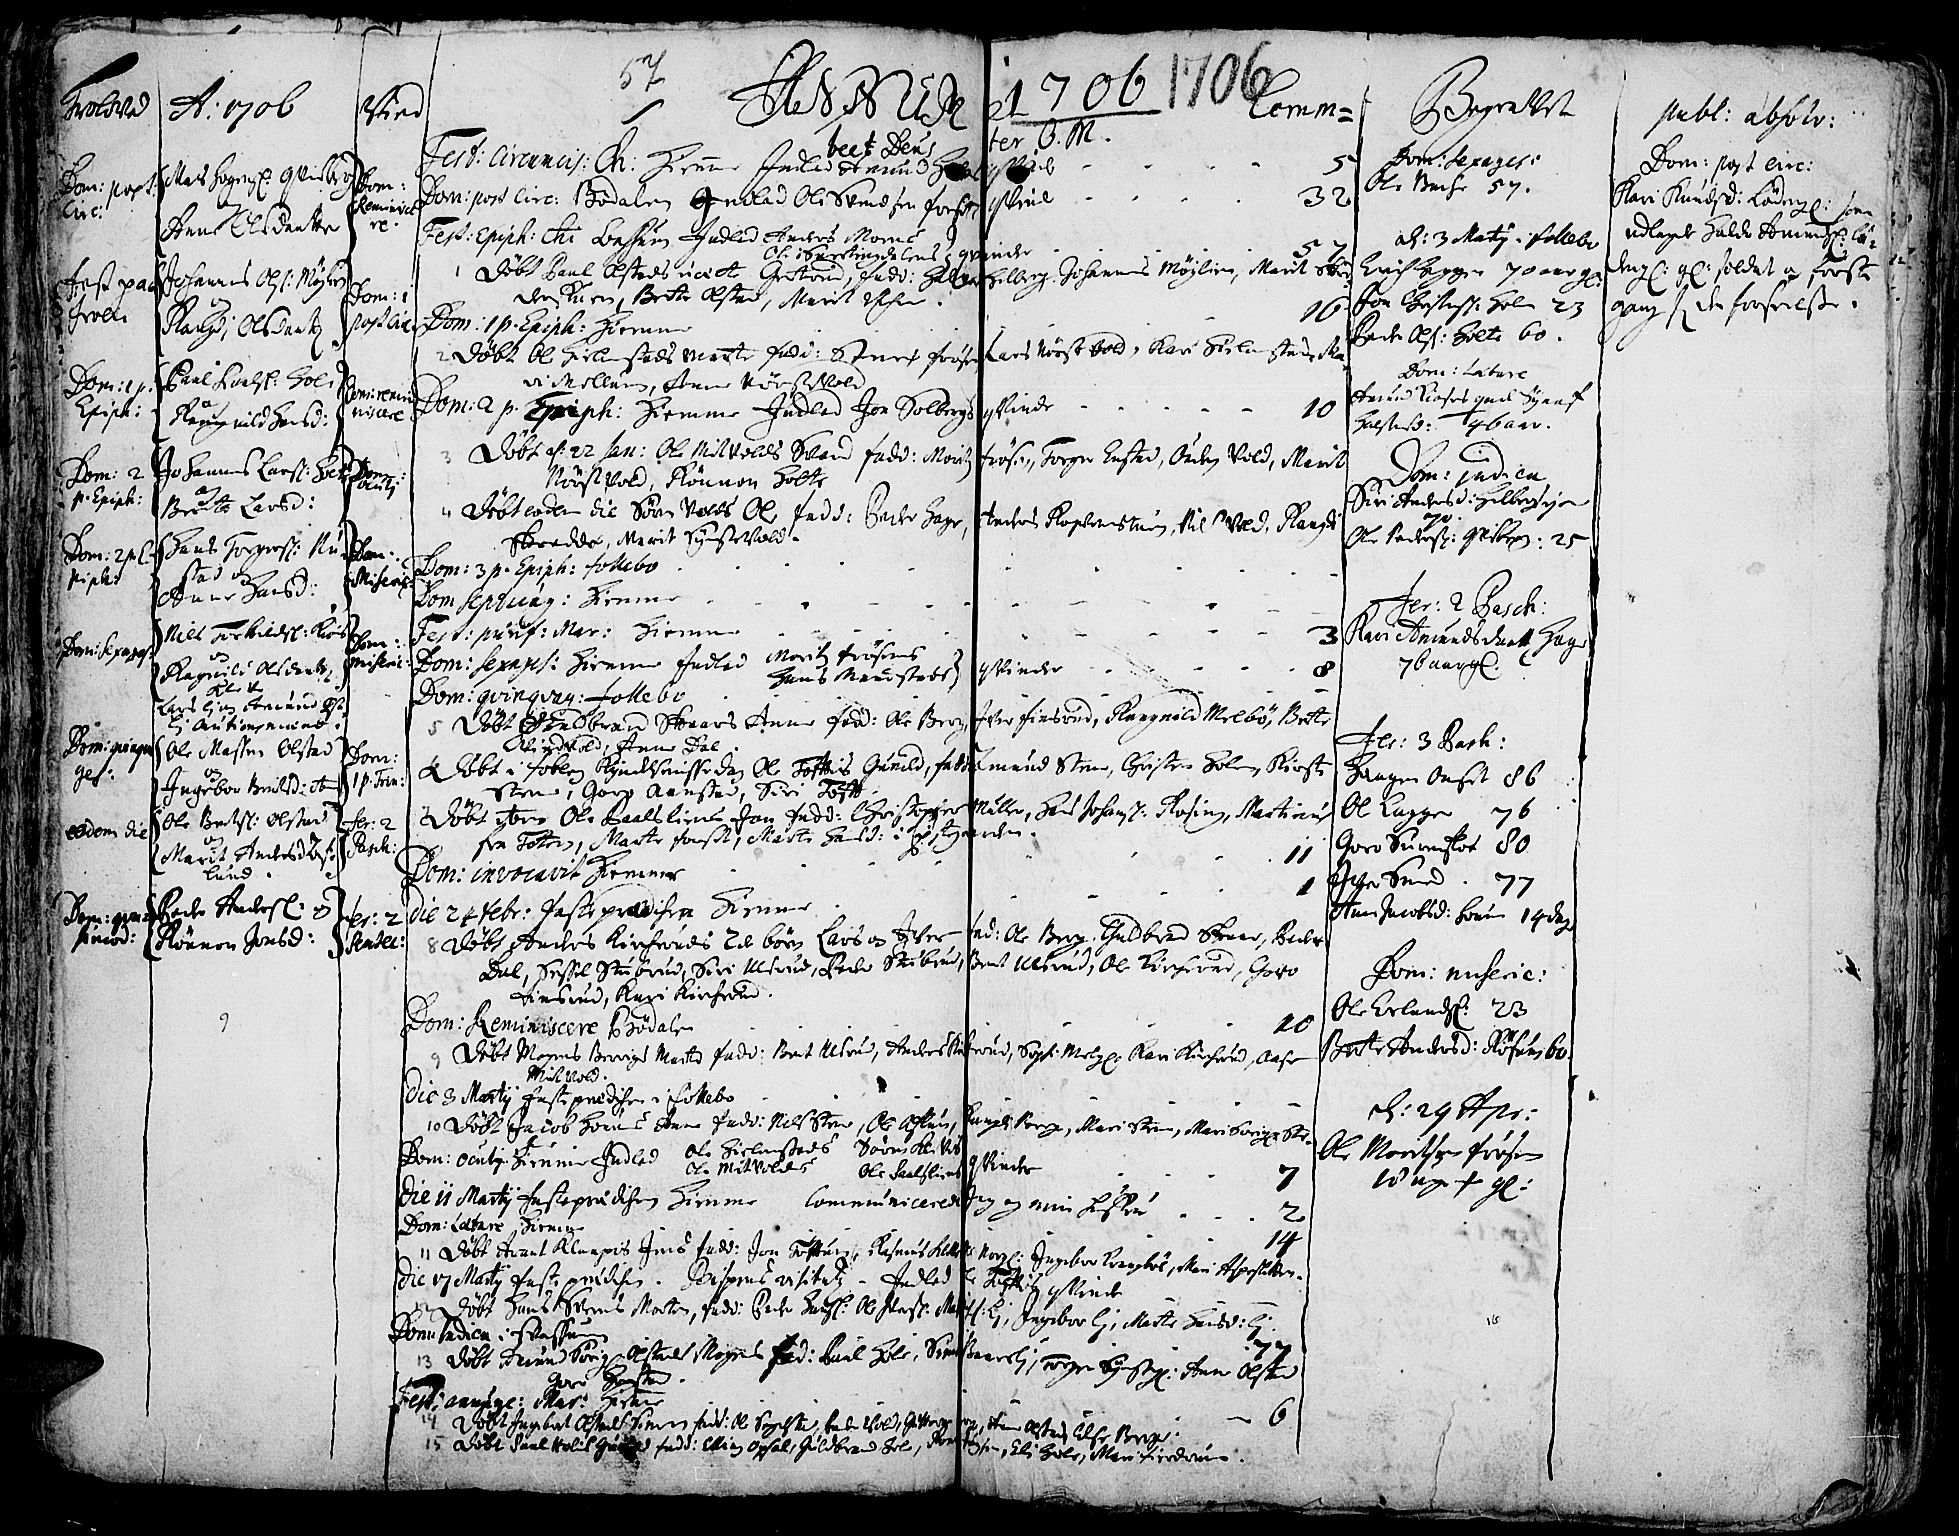 SAH, Gausdal prestekontor, Ministerialbok nr. 1, 1693-1728, s. 57